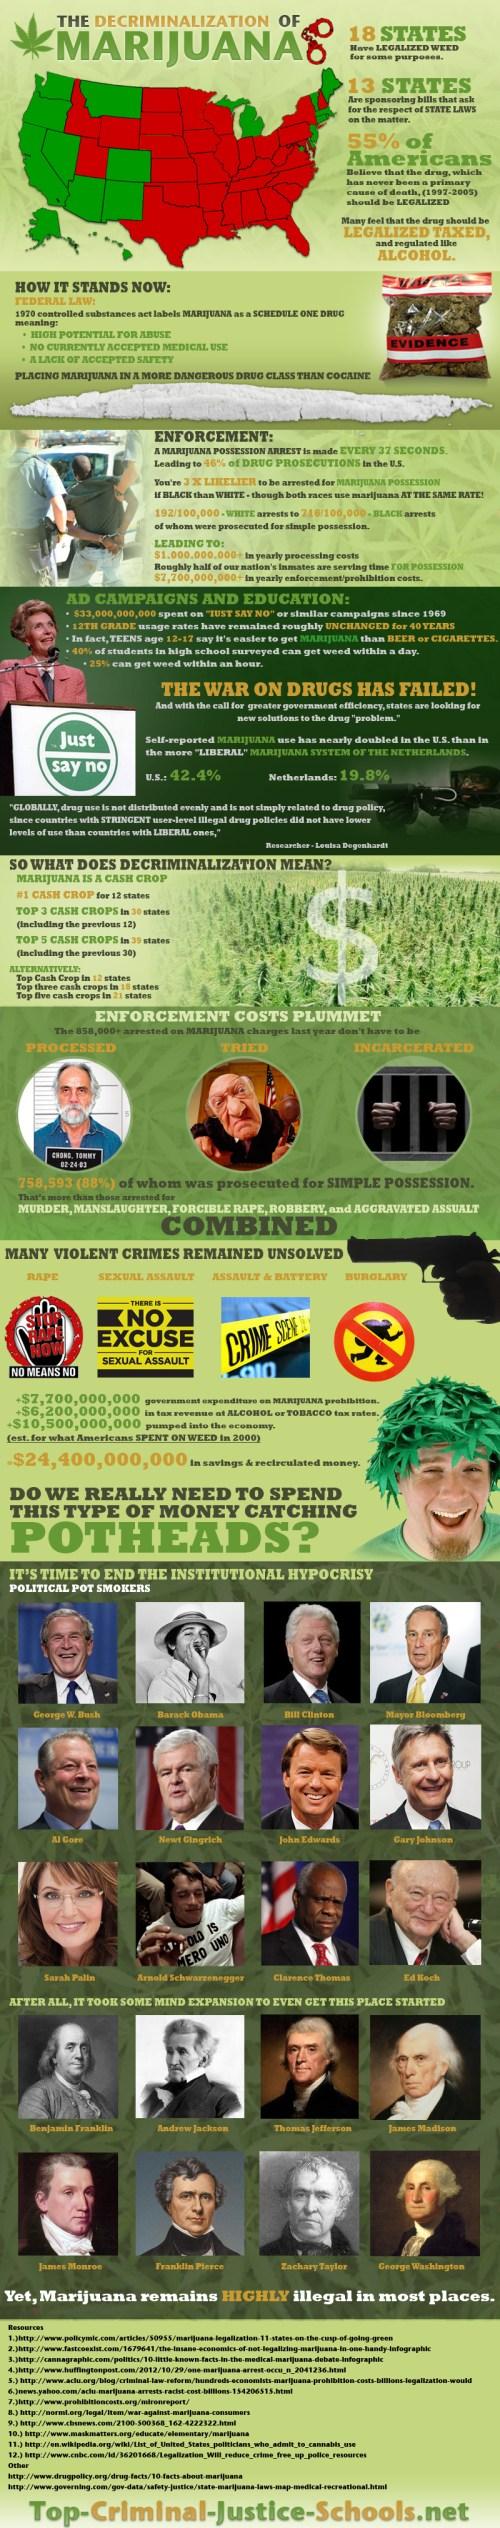 The Decriminalization of Marijuana